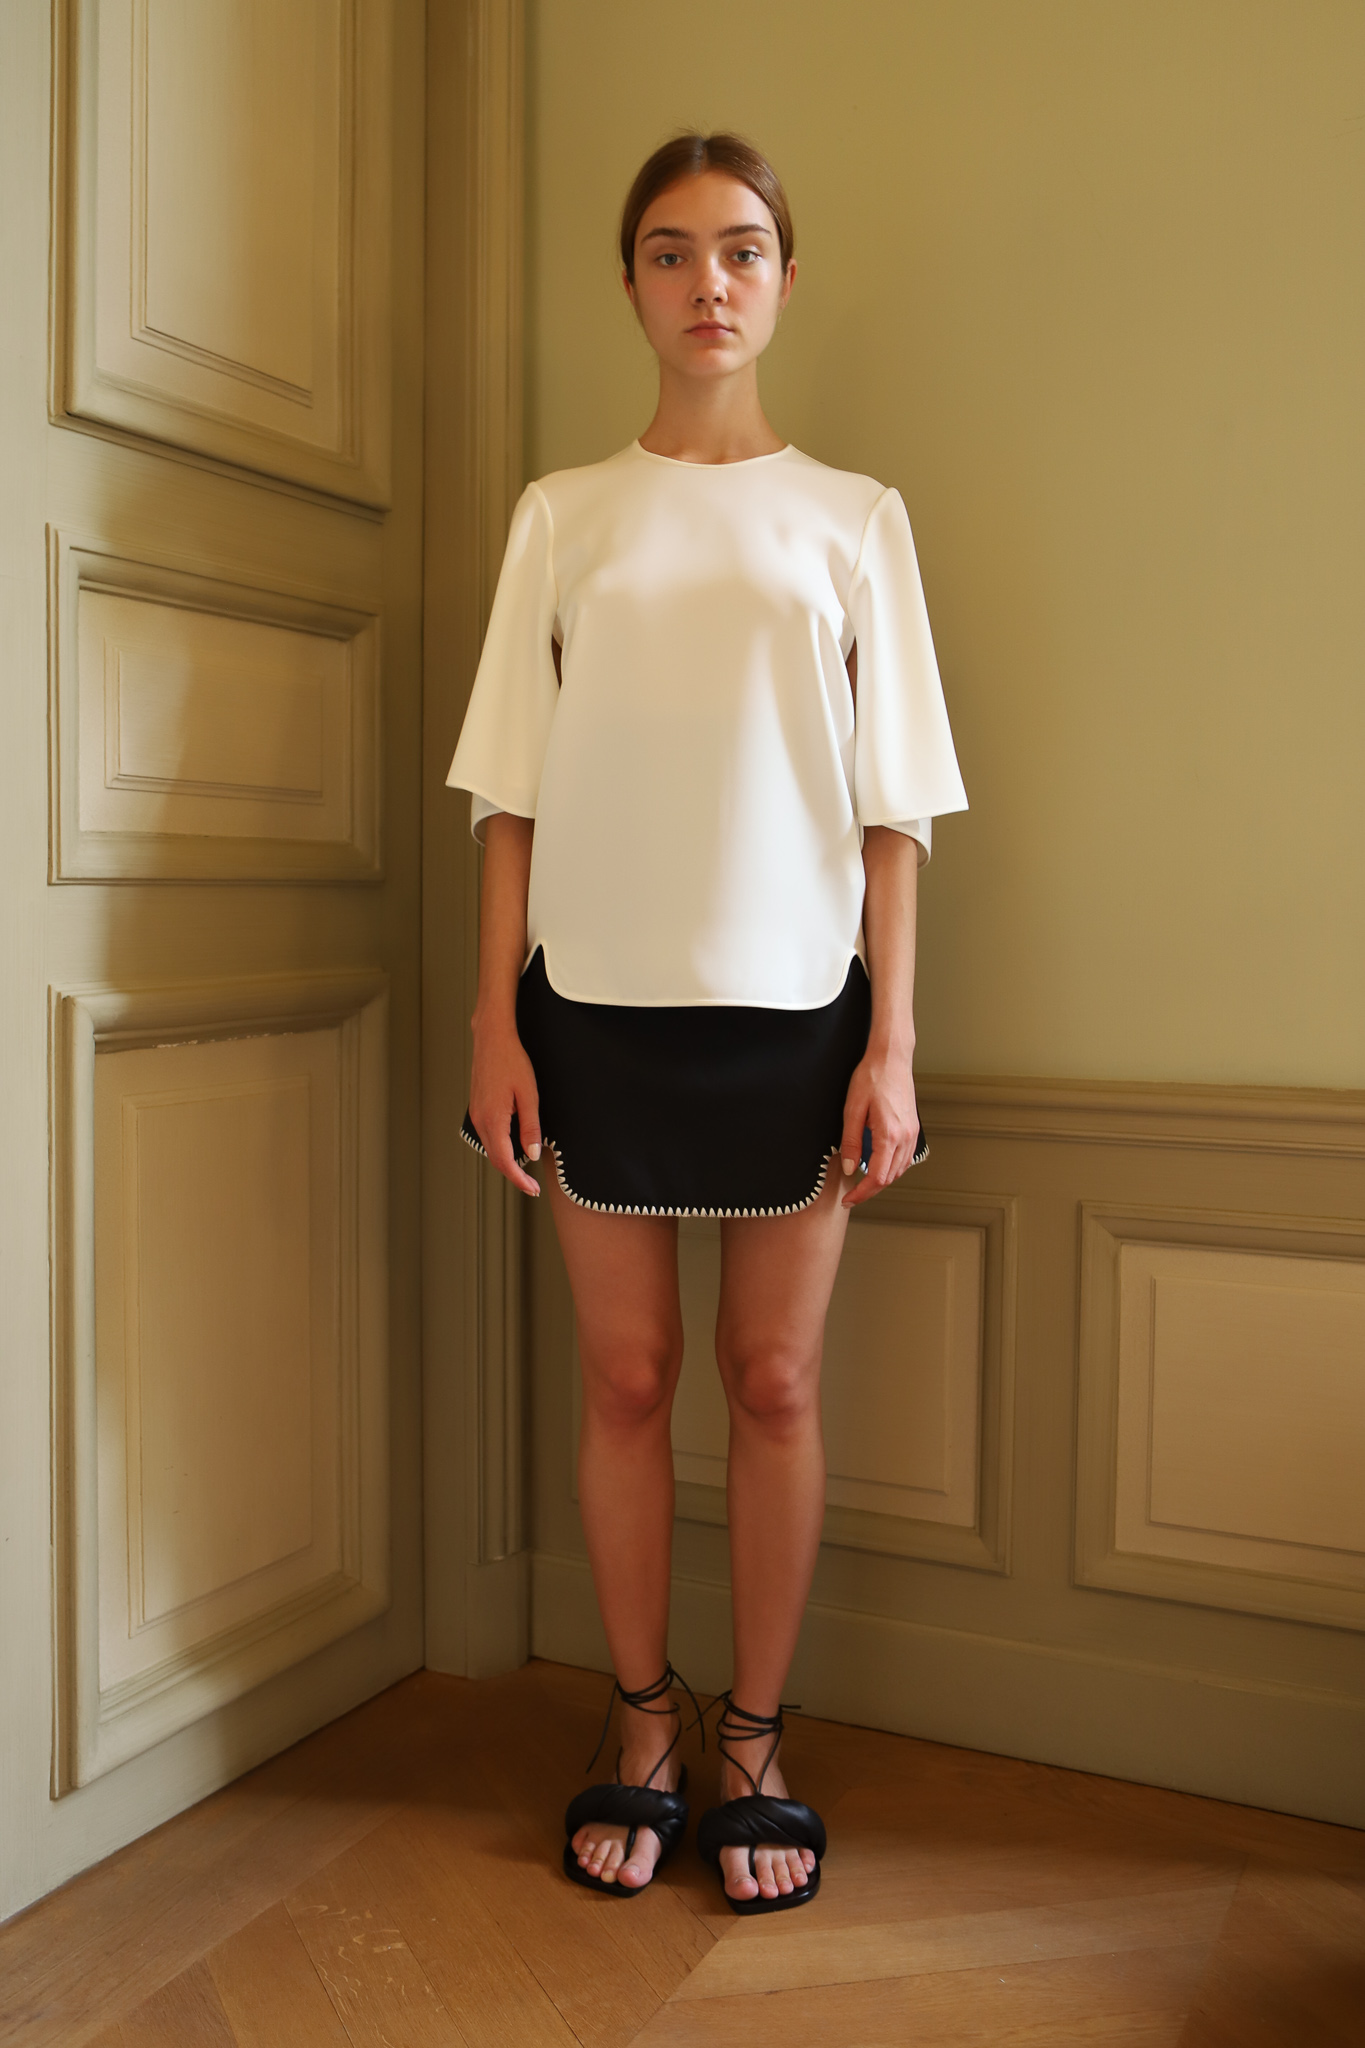 Ellery Mystic Force Flap Sleeve Top in White Mini Skirt in Black Spring 20 RTW